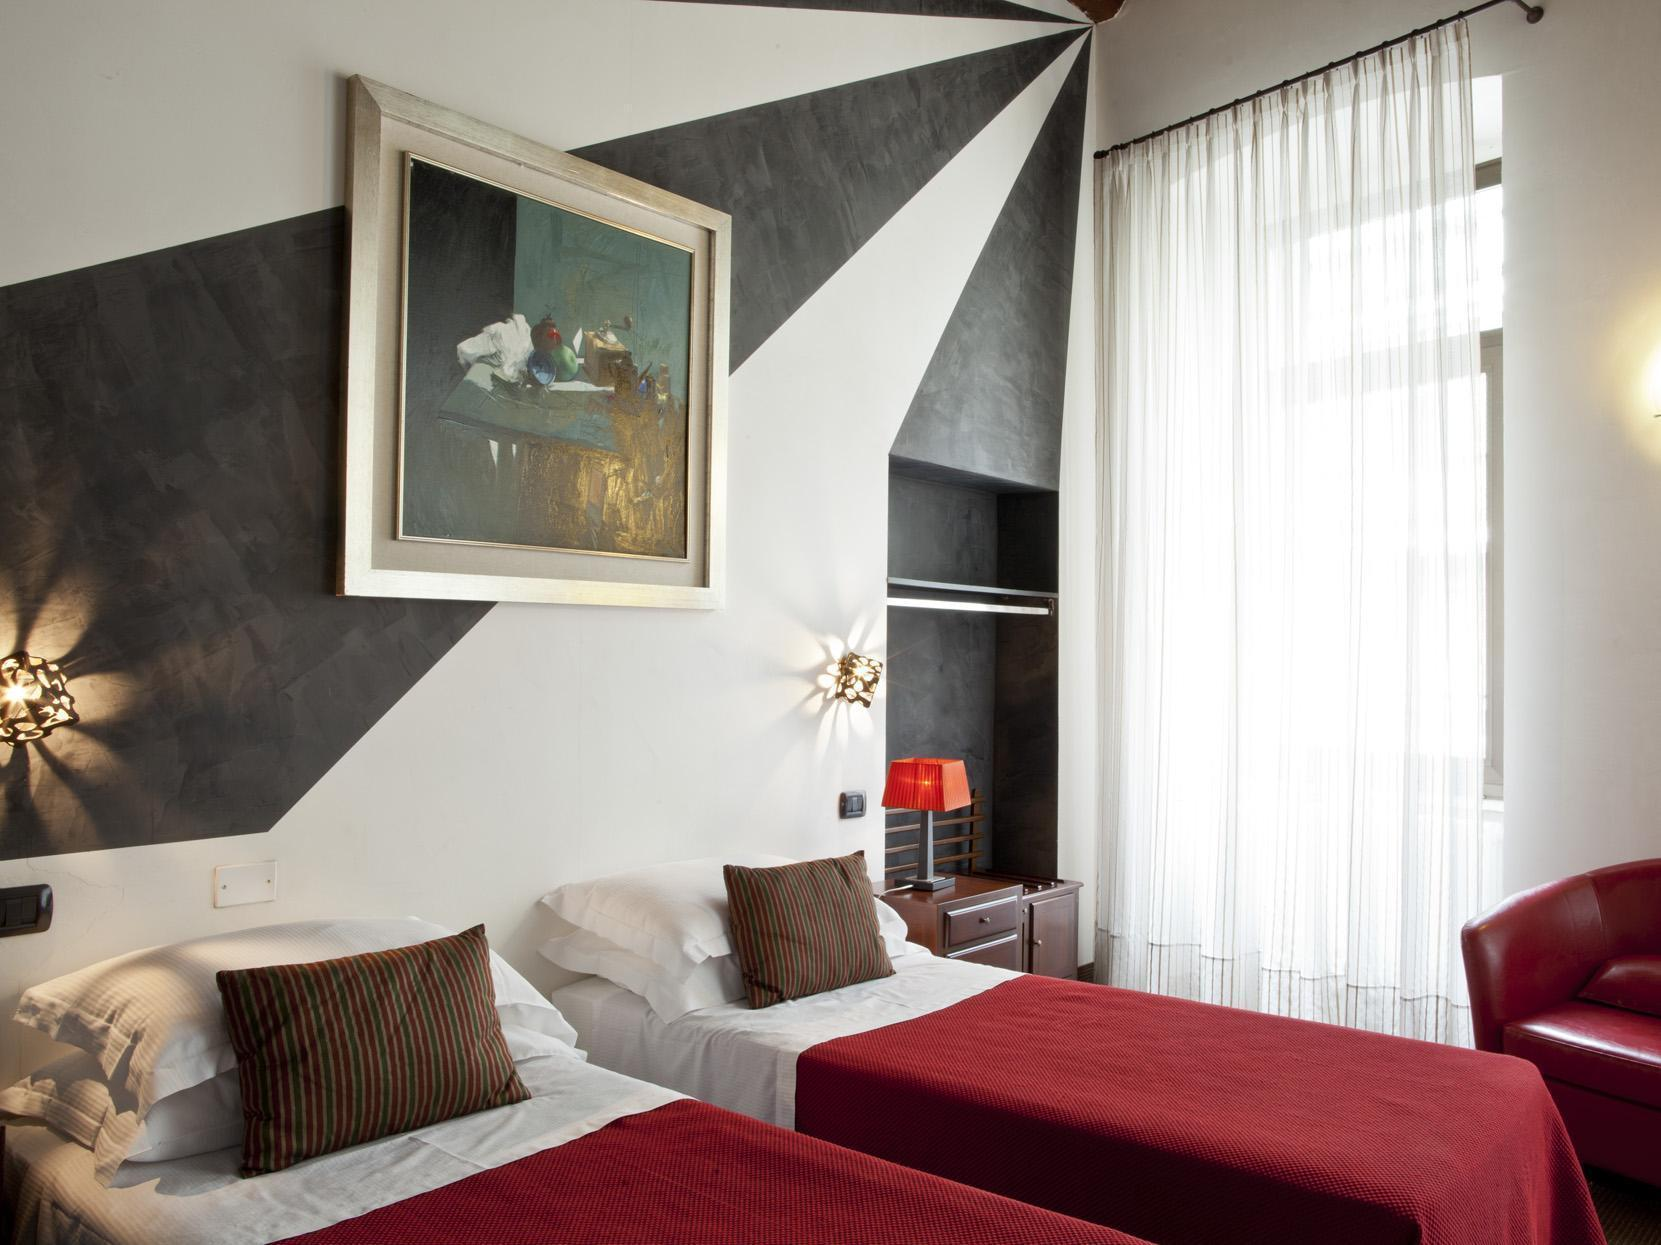 10 Best Verona Hotels: HD Photos + Reviews of Hotels in Verona, Italy